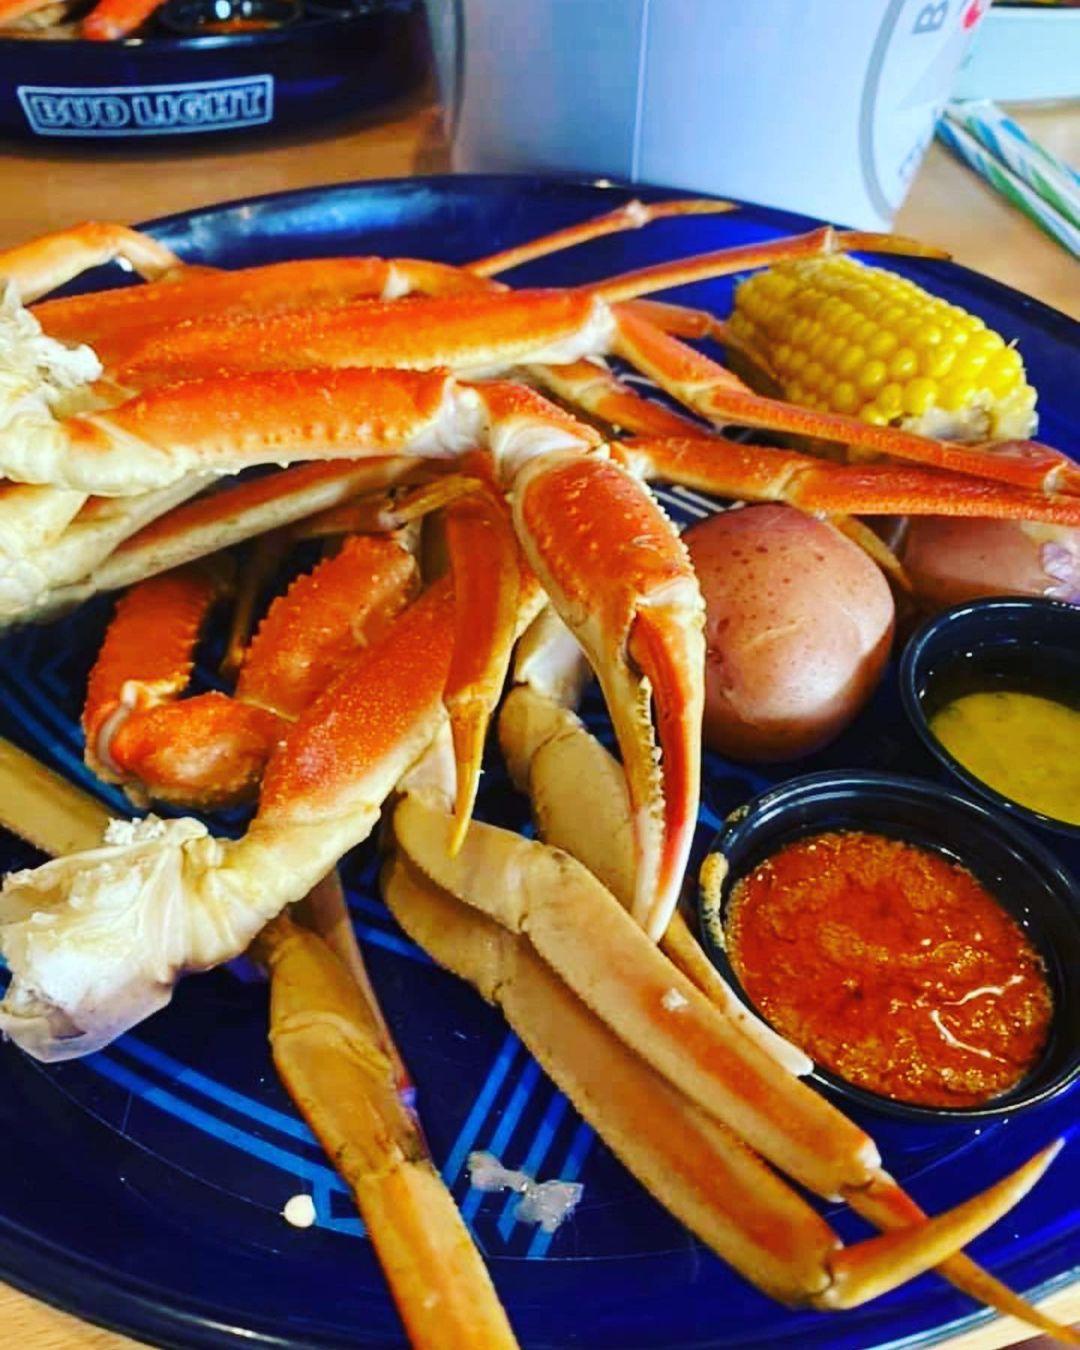 Image Courtesy: Kat's Seafood Kitchen